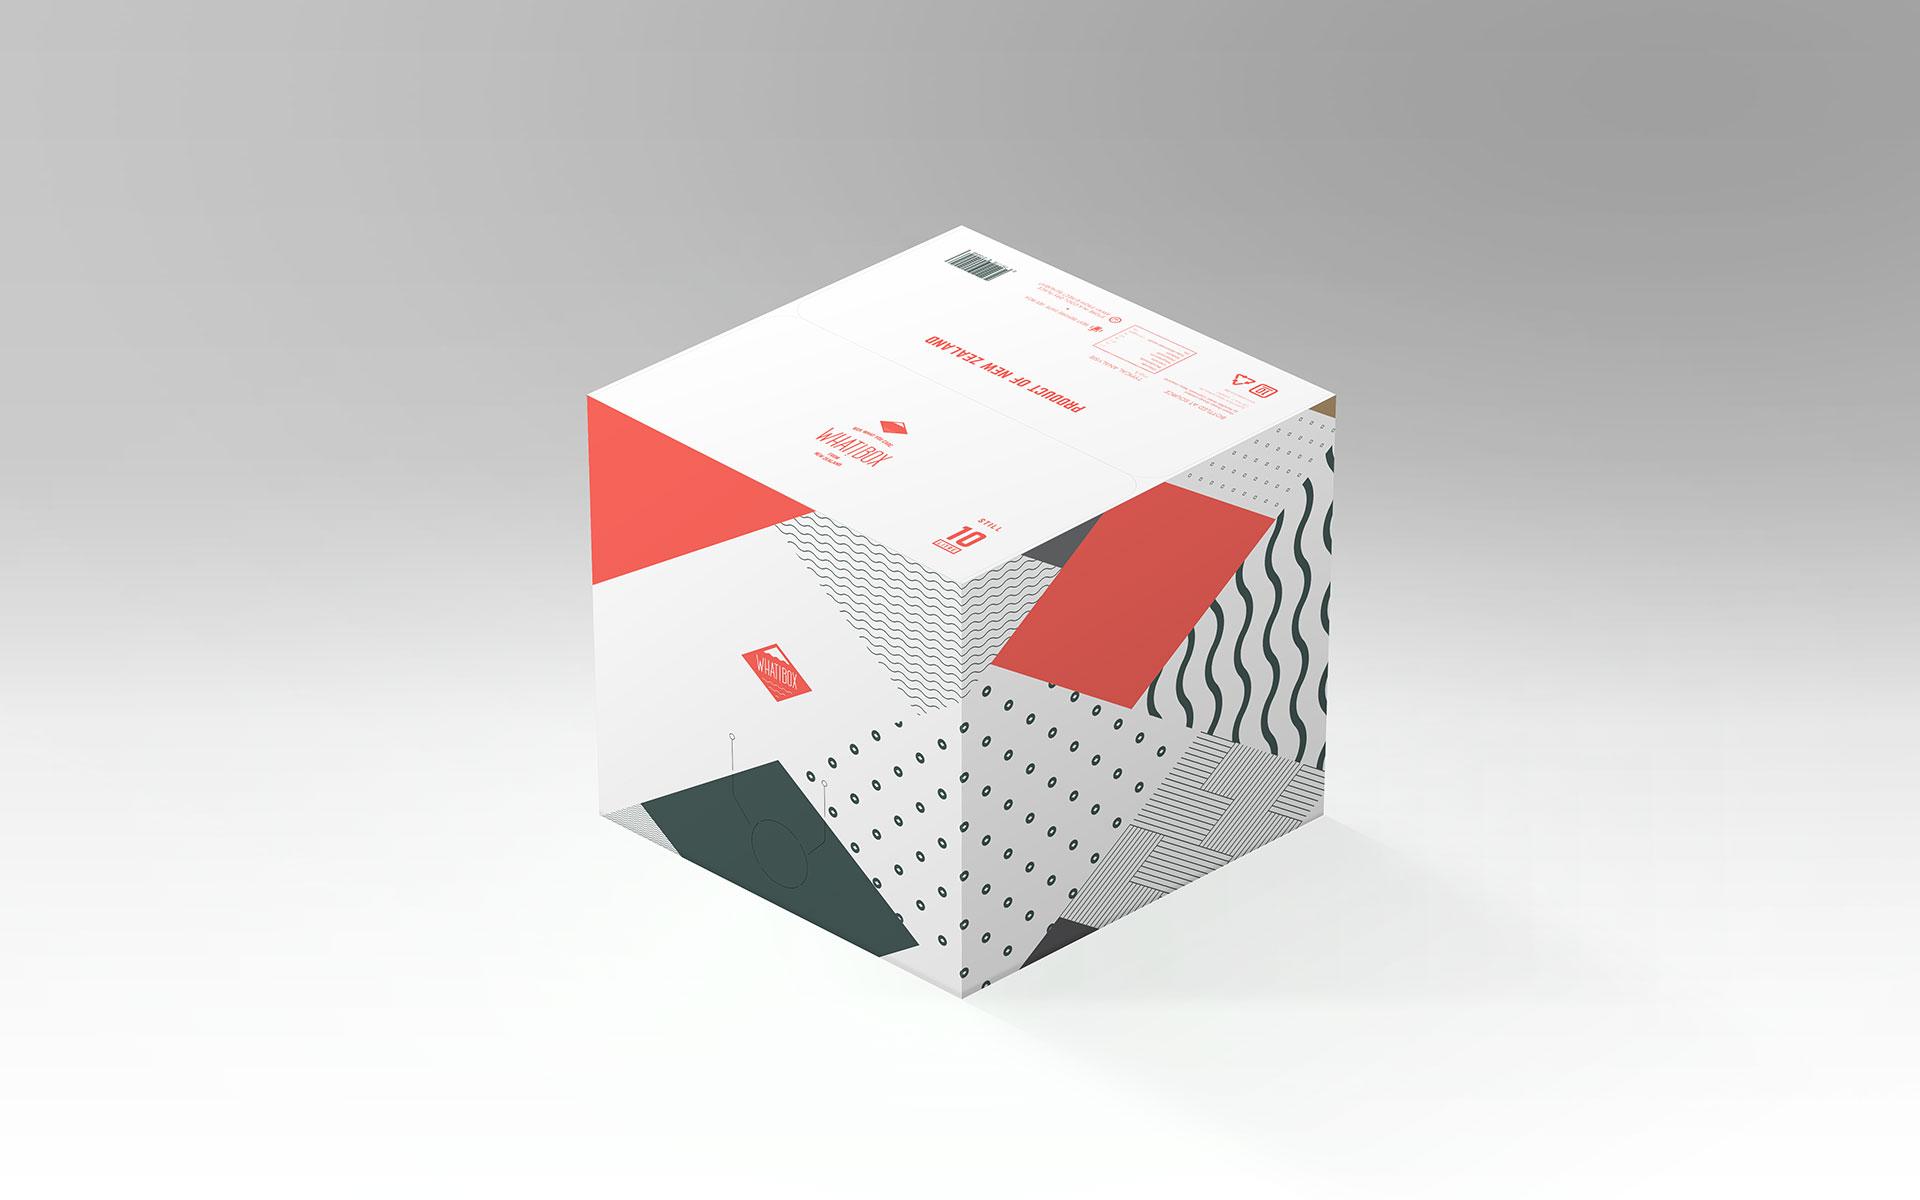 wb_package_mockup1